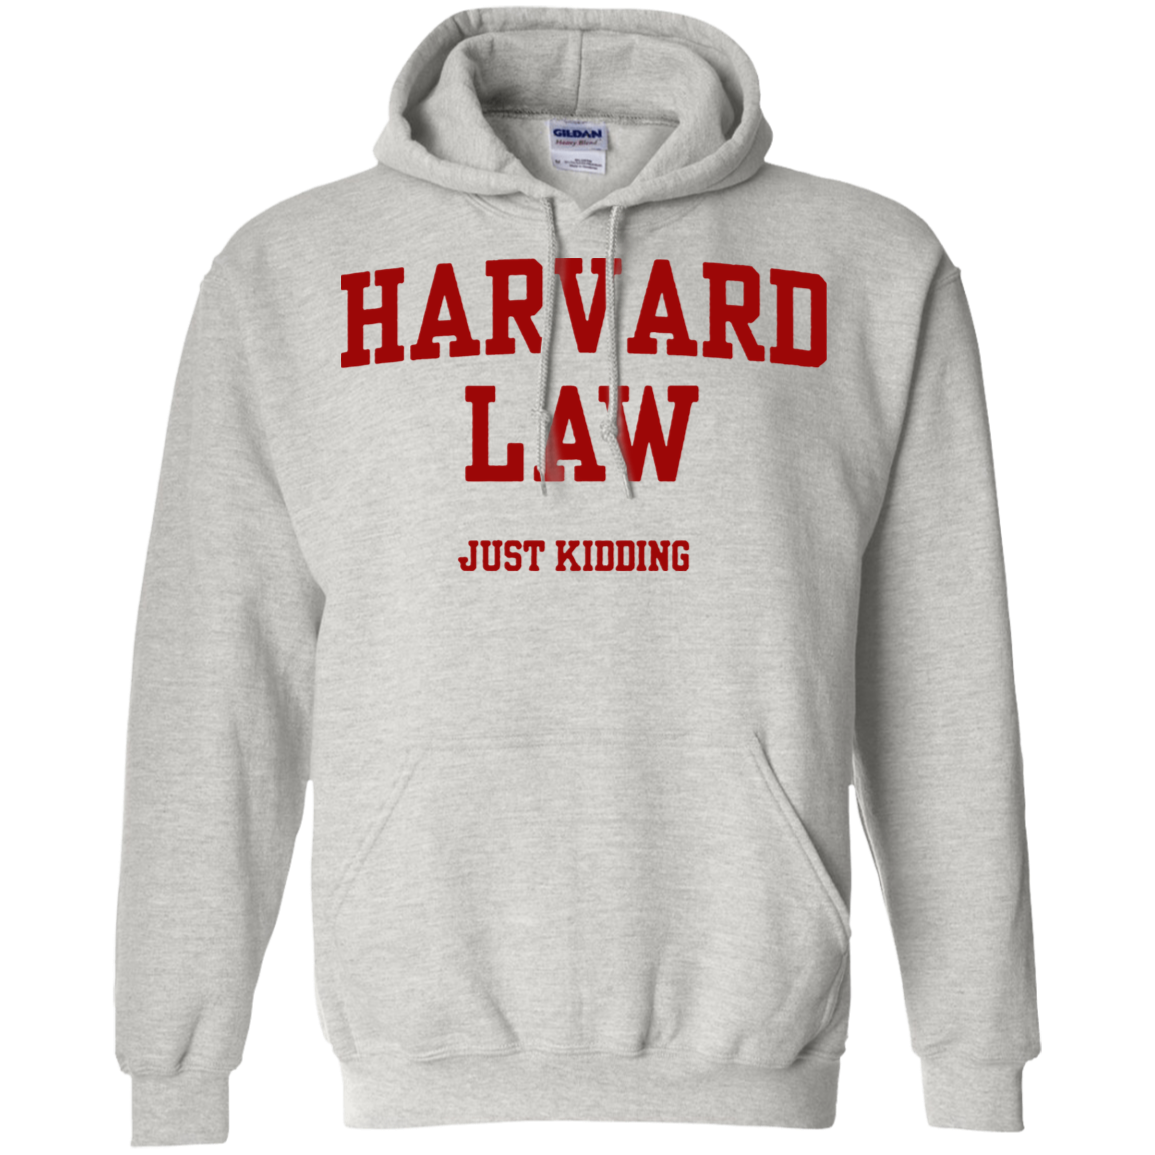 Harvard Law Just Ding Shirt G185 Pullover 8 Oz